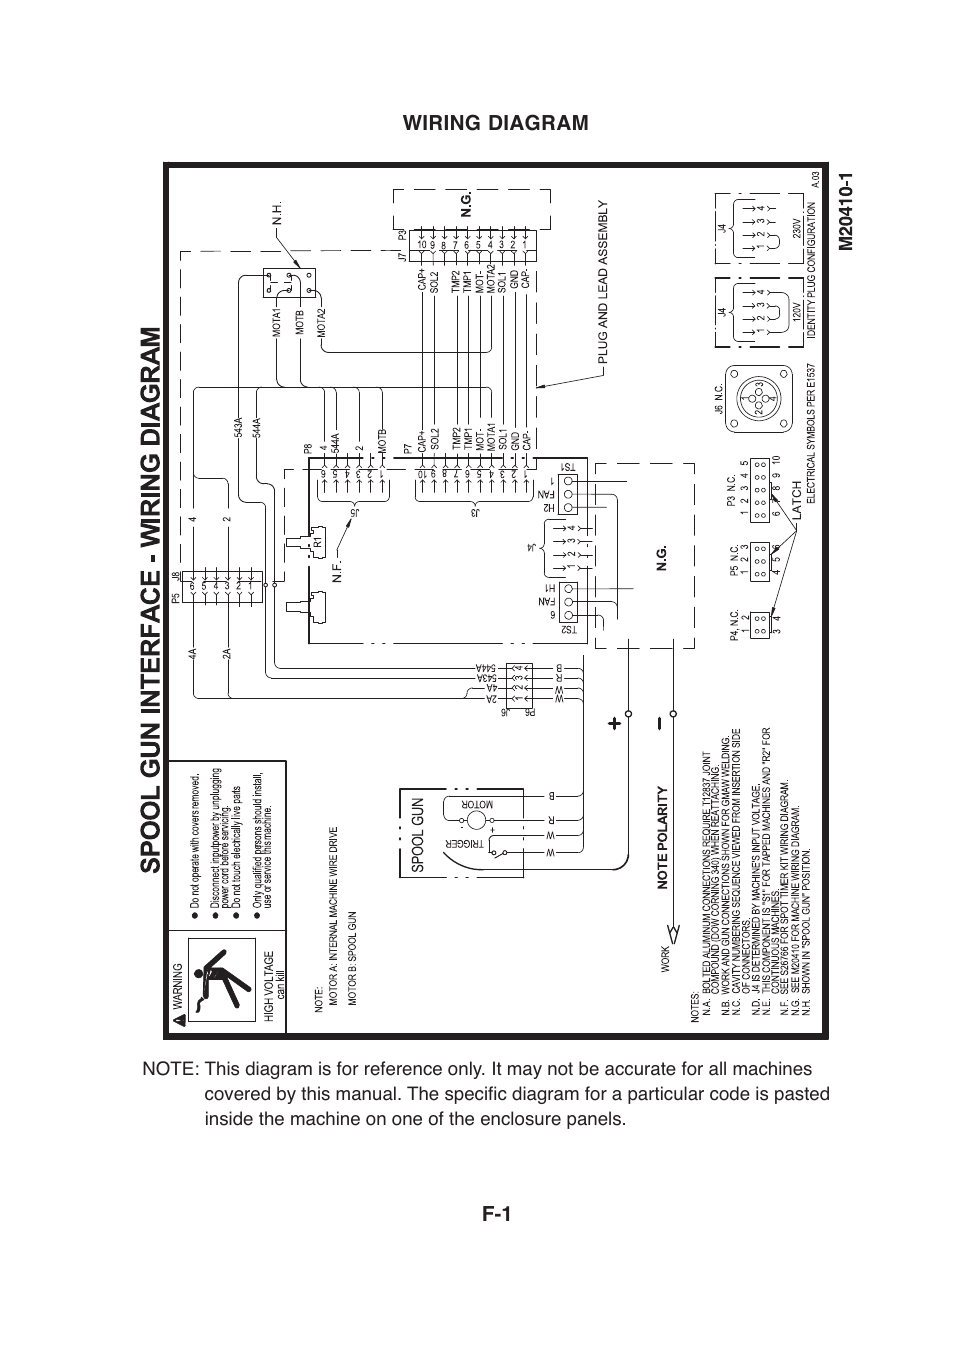 Diagram Lincoln 100sg Wiring Diagram Full Version Hd Quality Wiring Diagram Impactodiagramak Nuovarmata It